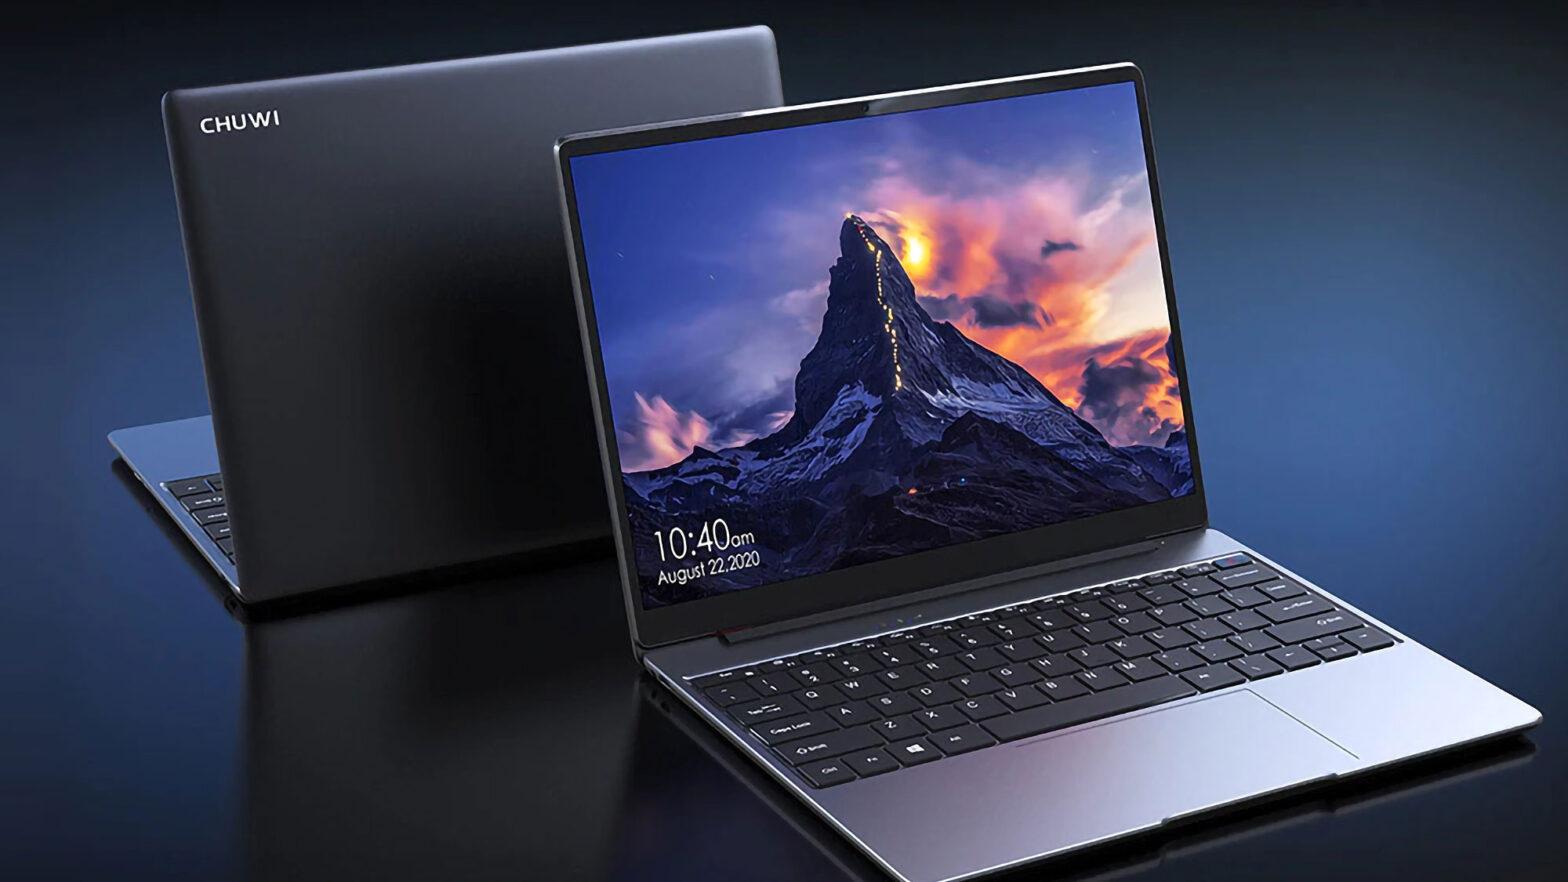 Chuwi GemiBook 13-inch 2K Display Laptop